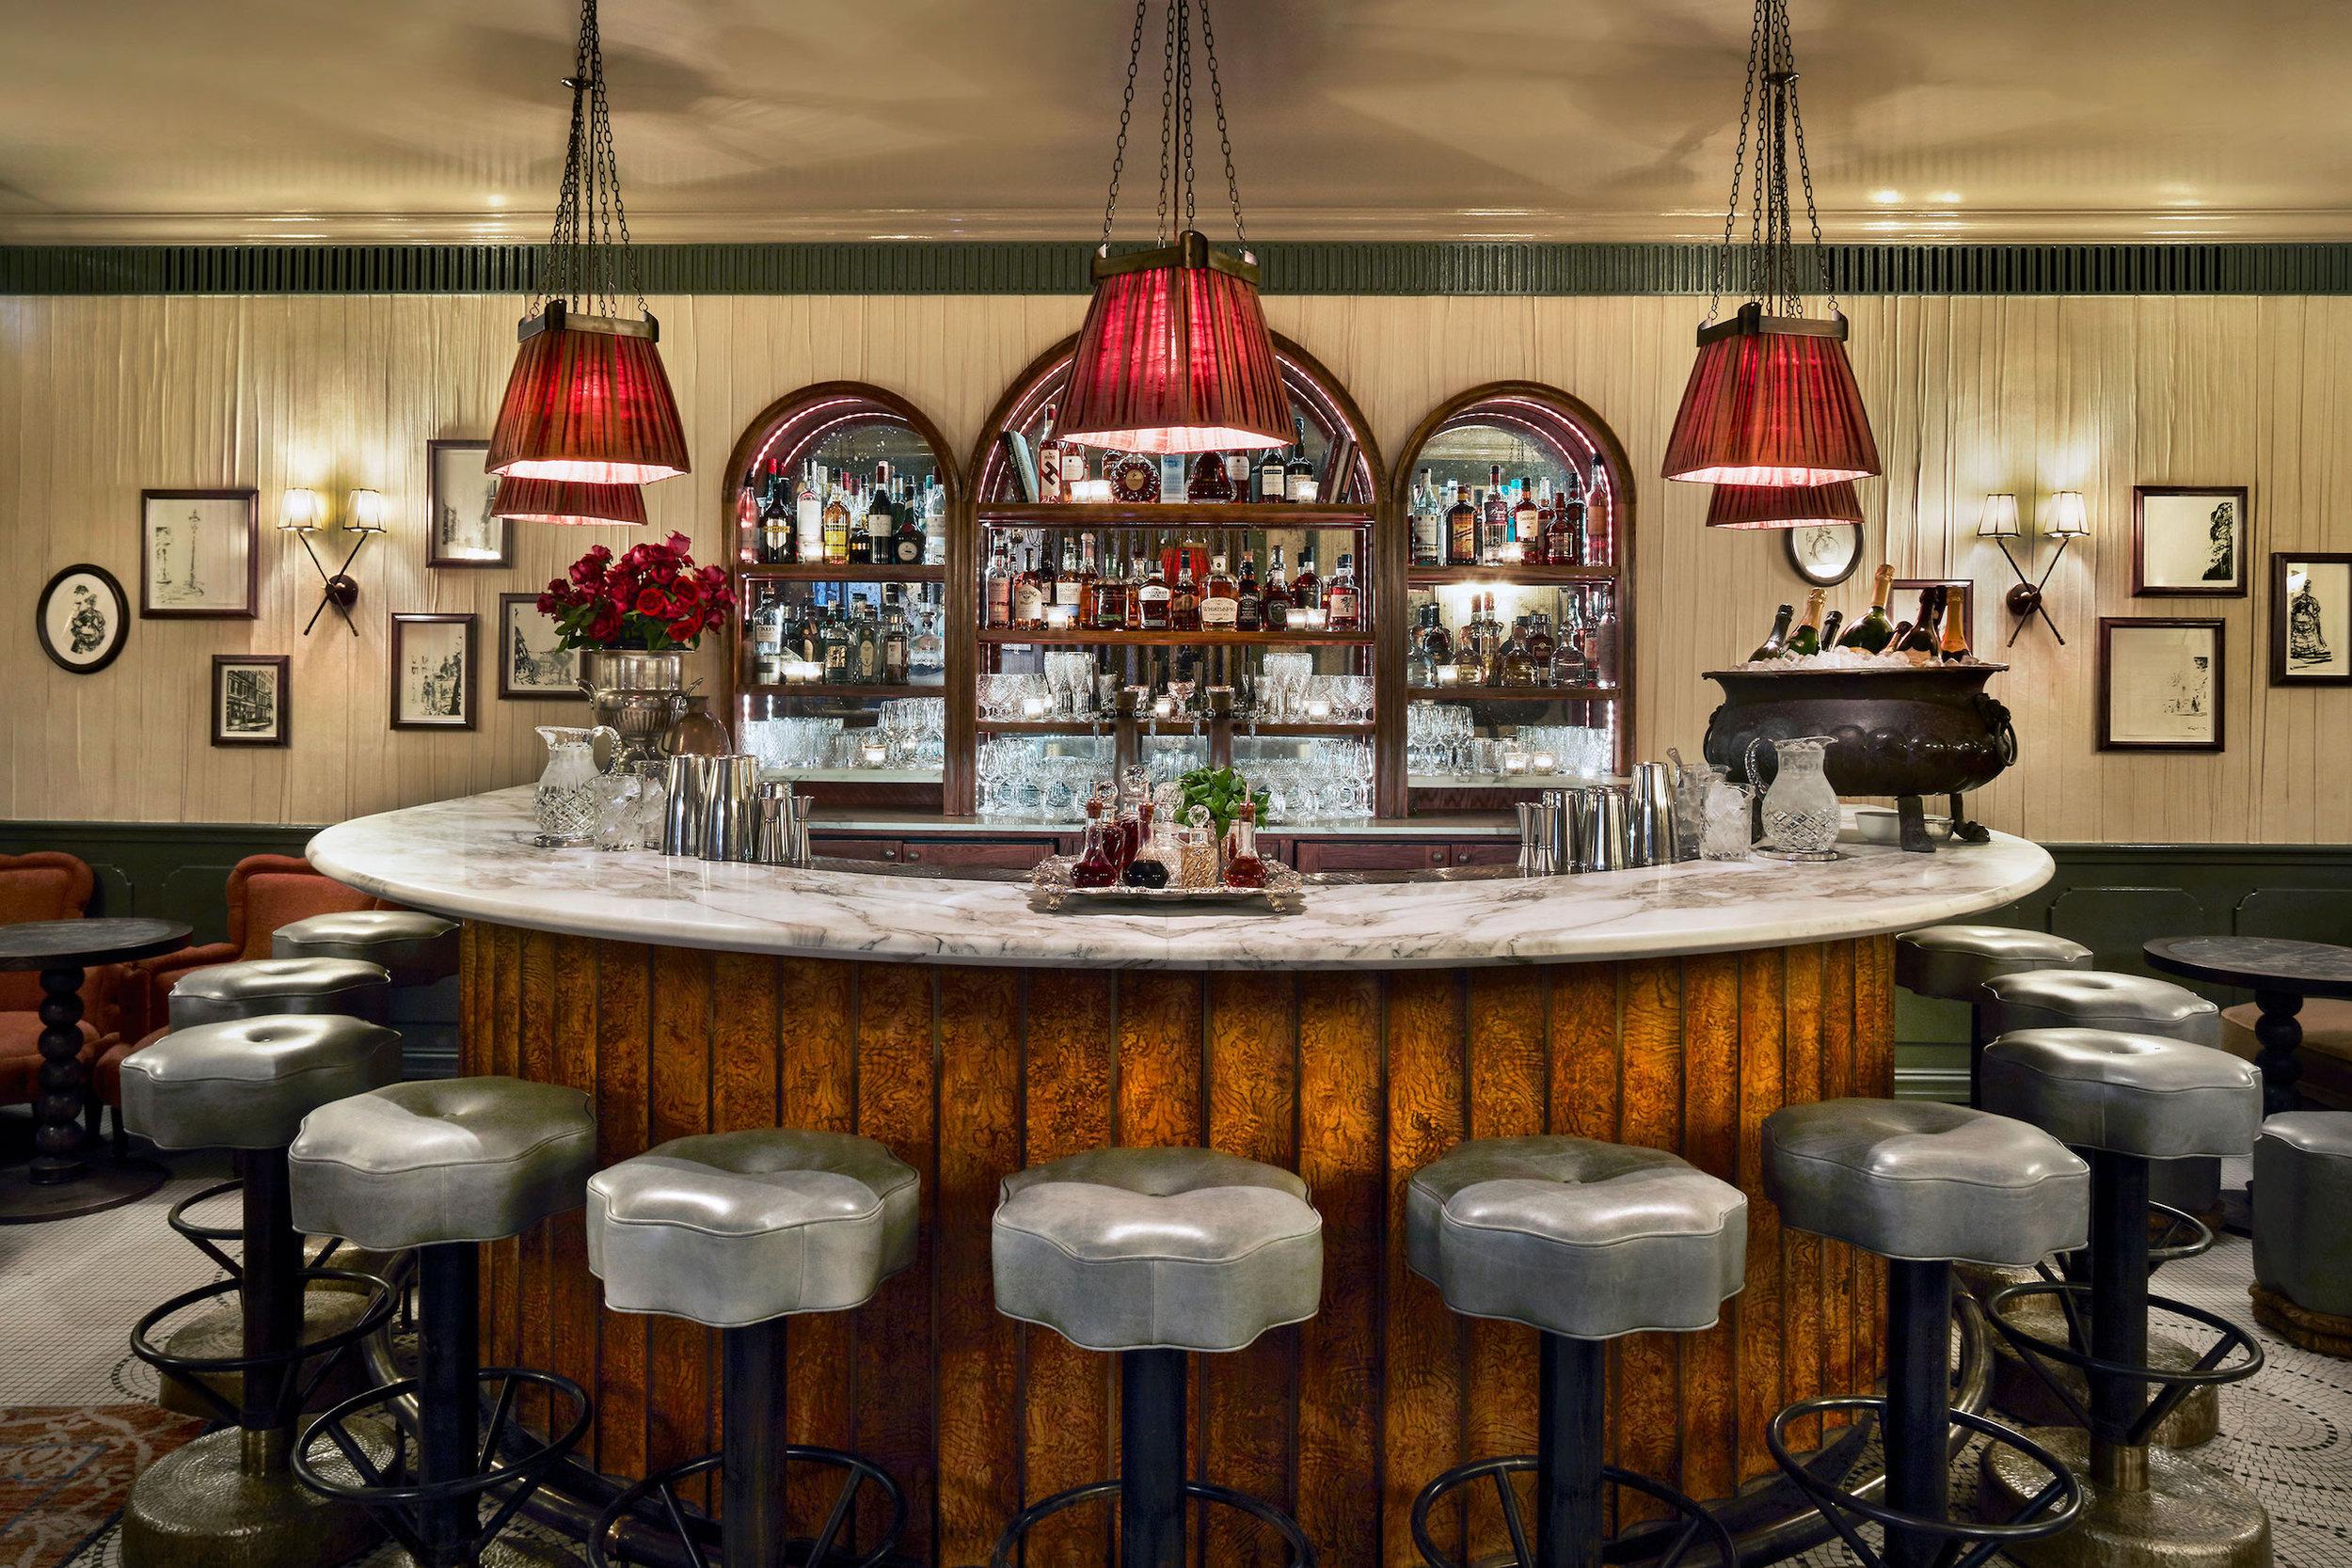 Kettners-Townhouse-Champagne-Bar-Grandirosa-flowers.jpg